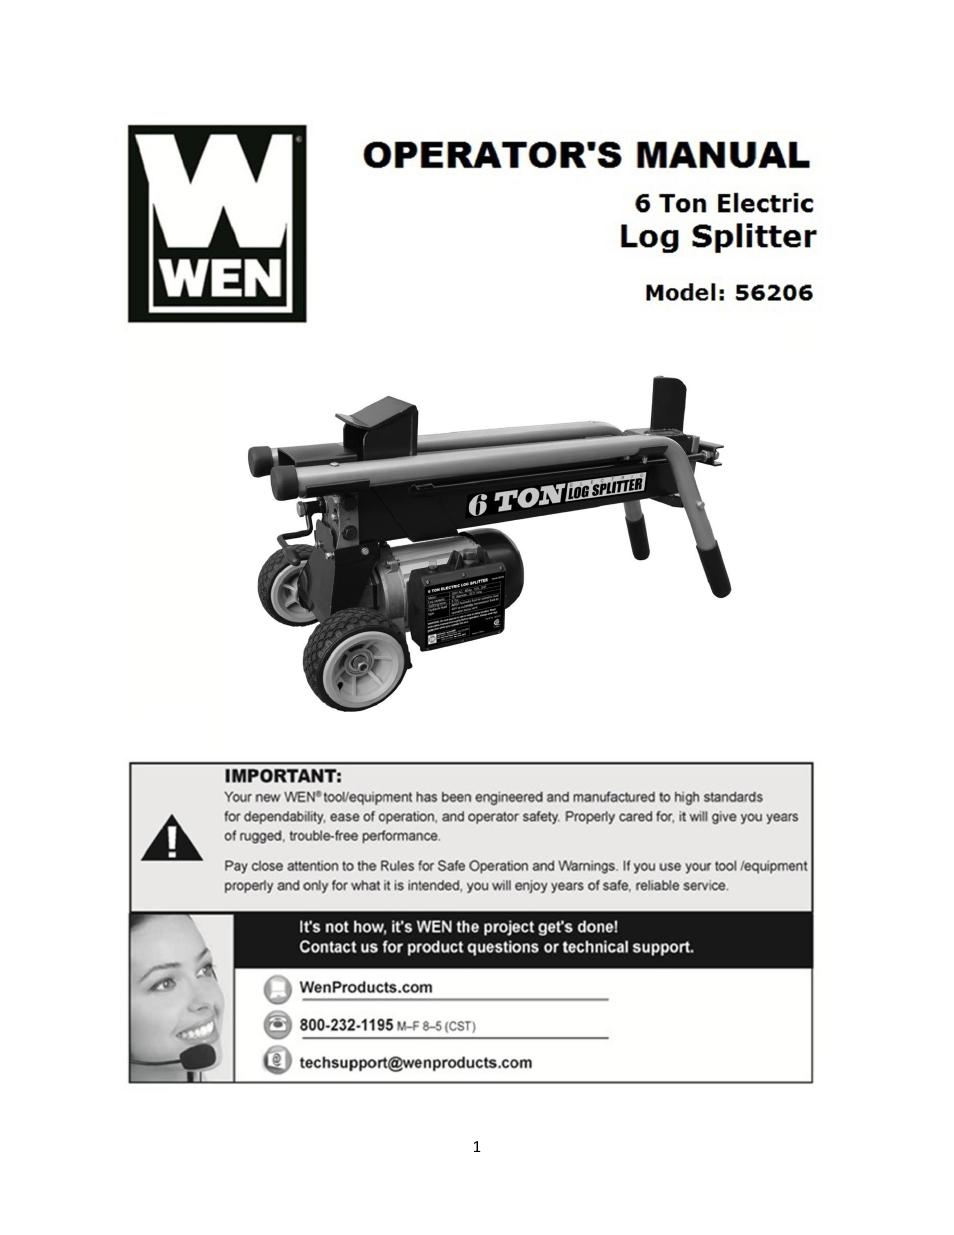 wen 56206 6 ton electric log splitter user manual 21 pages rh manualsdir com Build Your Own Log Splitter Log Splitter Wedge